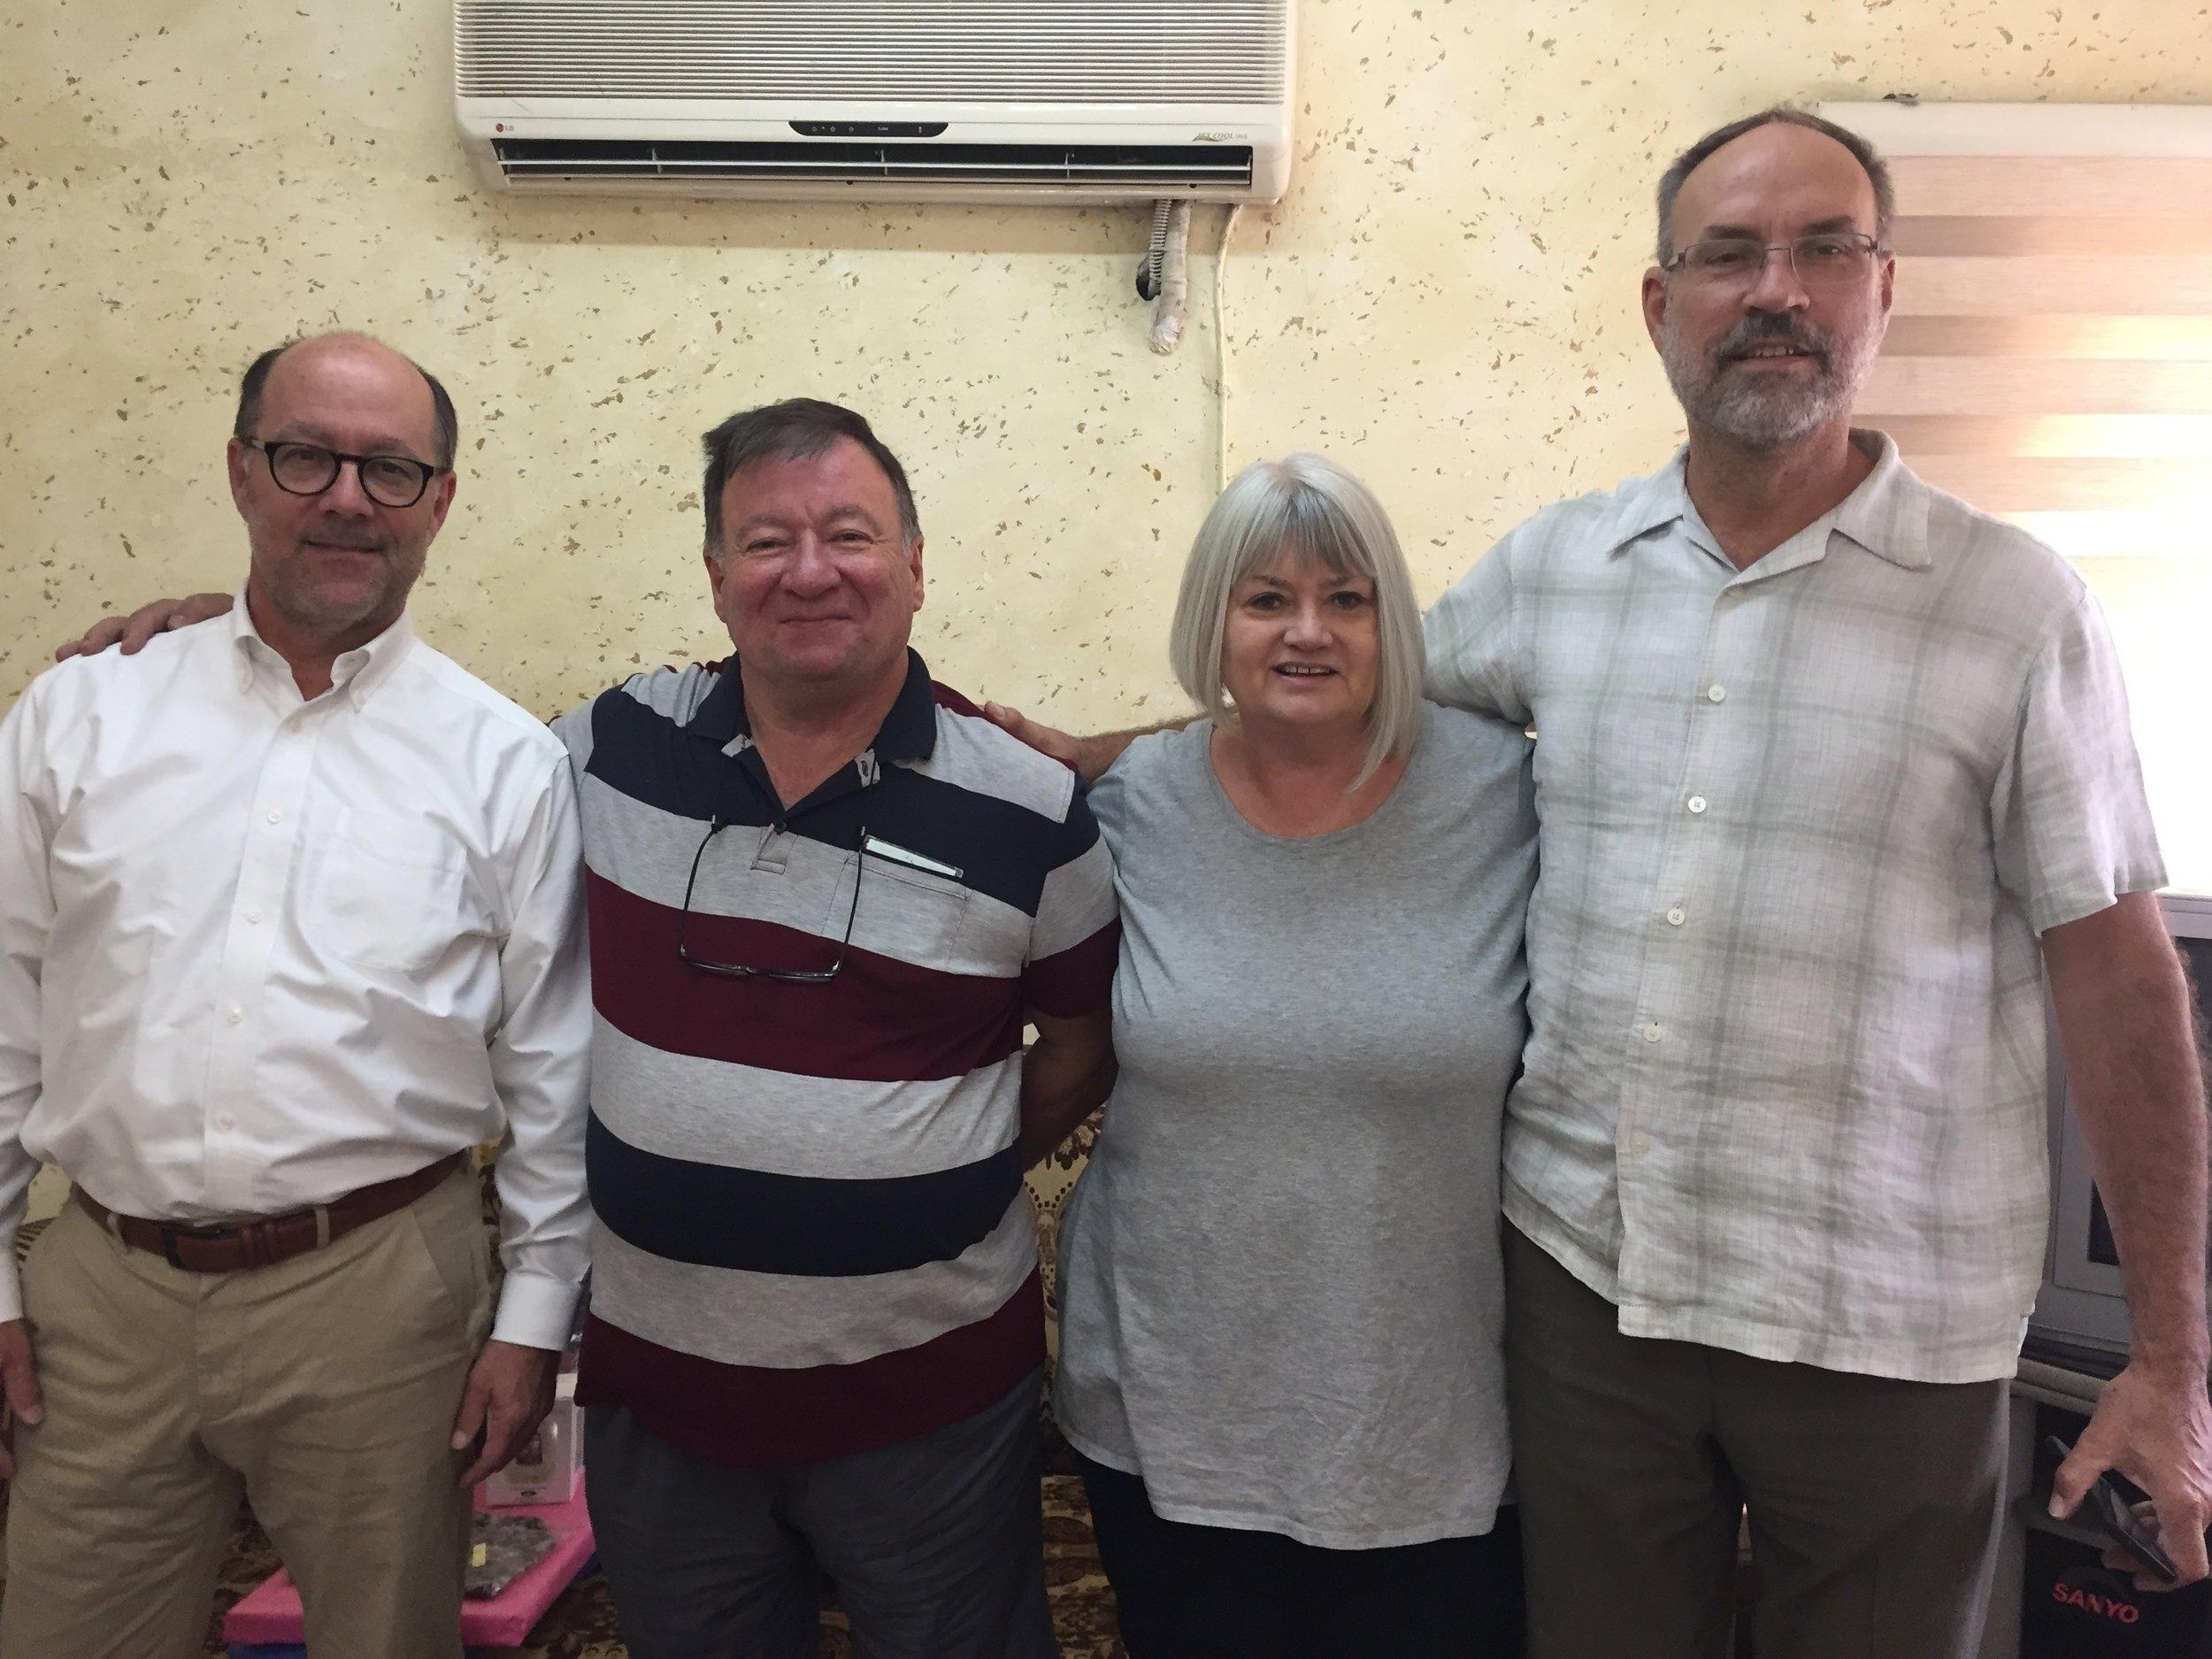 Ben McCaleb(left-First Presbyterian, San Antonio), Steve Burgess (right-West Hills Presbyterian, Omaha) and I met with Rev. Haitham in Baghdad in November.